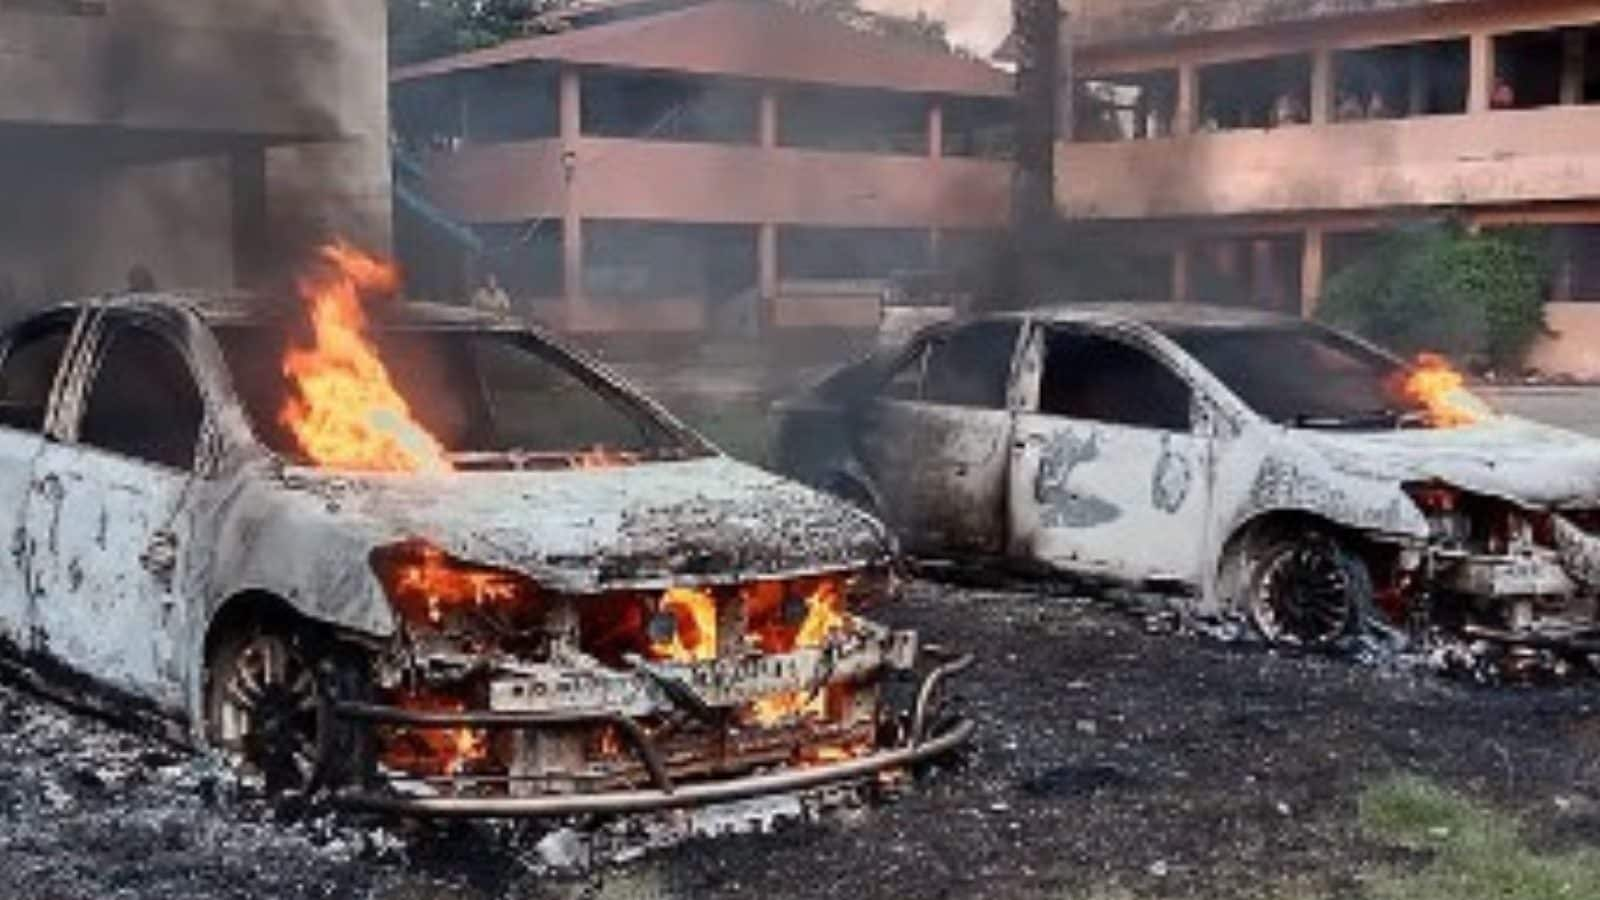 Bengal BJP Leaders to Meet PM Modi to Raise Attacks on Hindus in Bangladesh